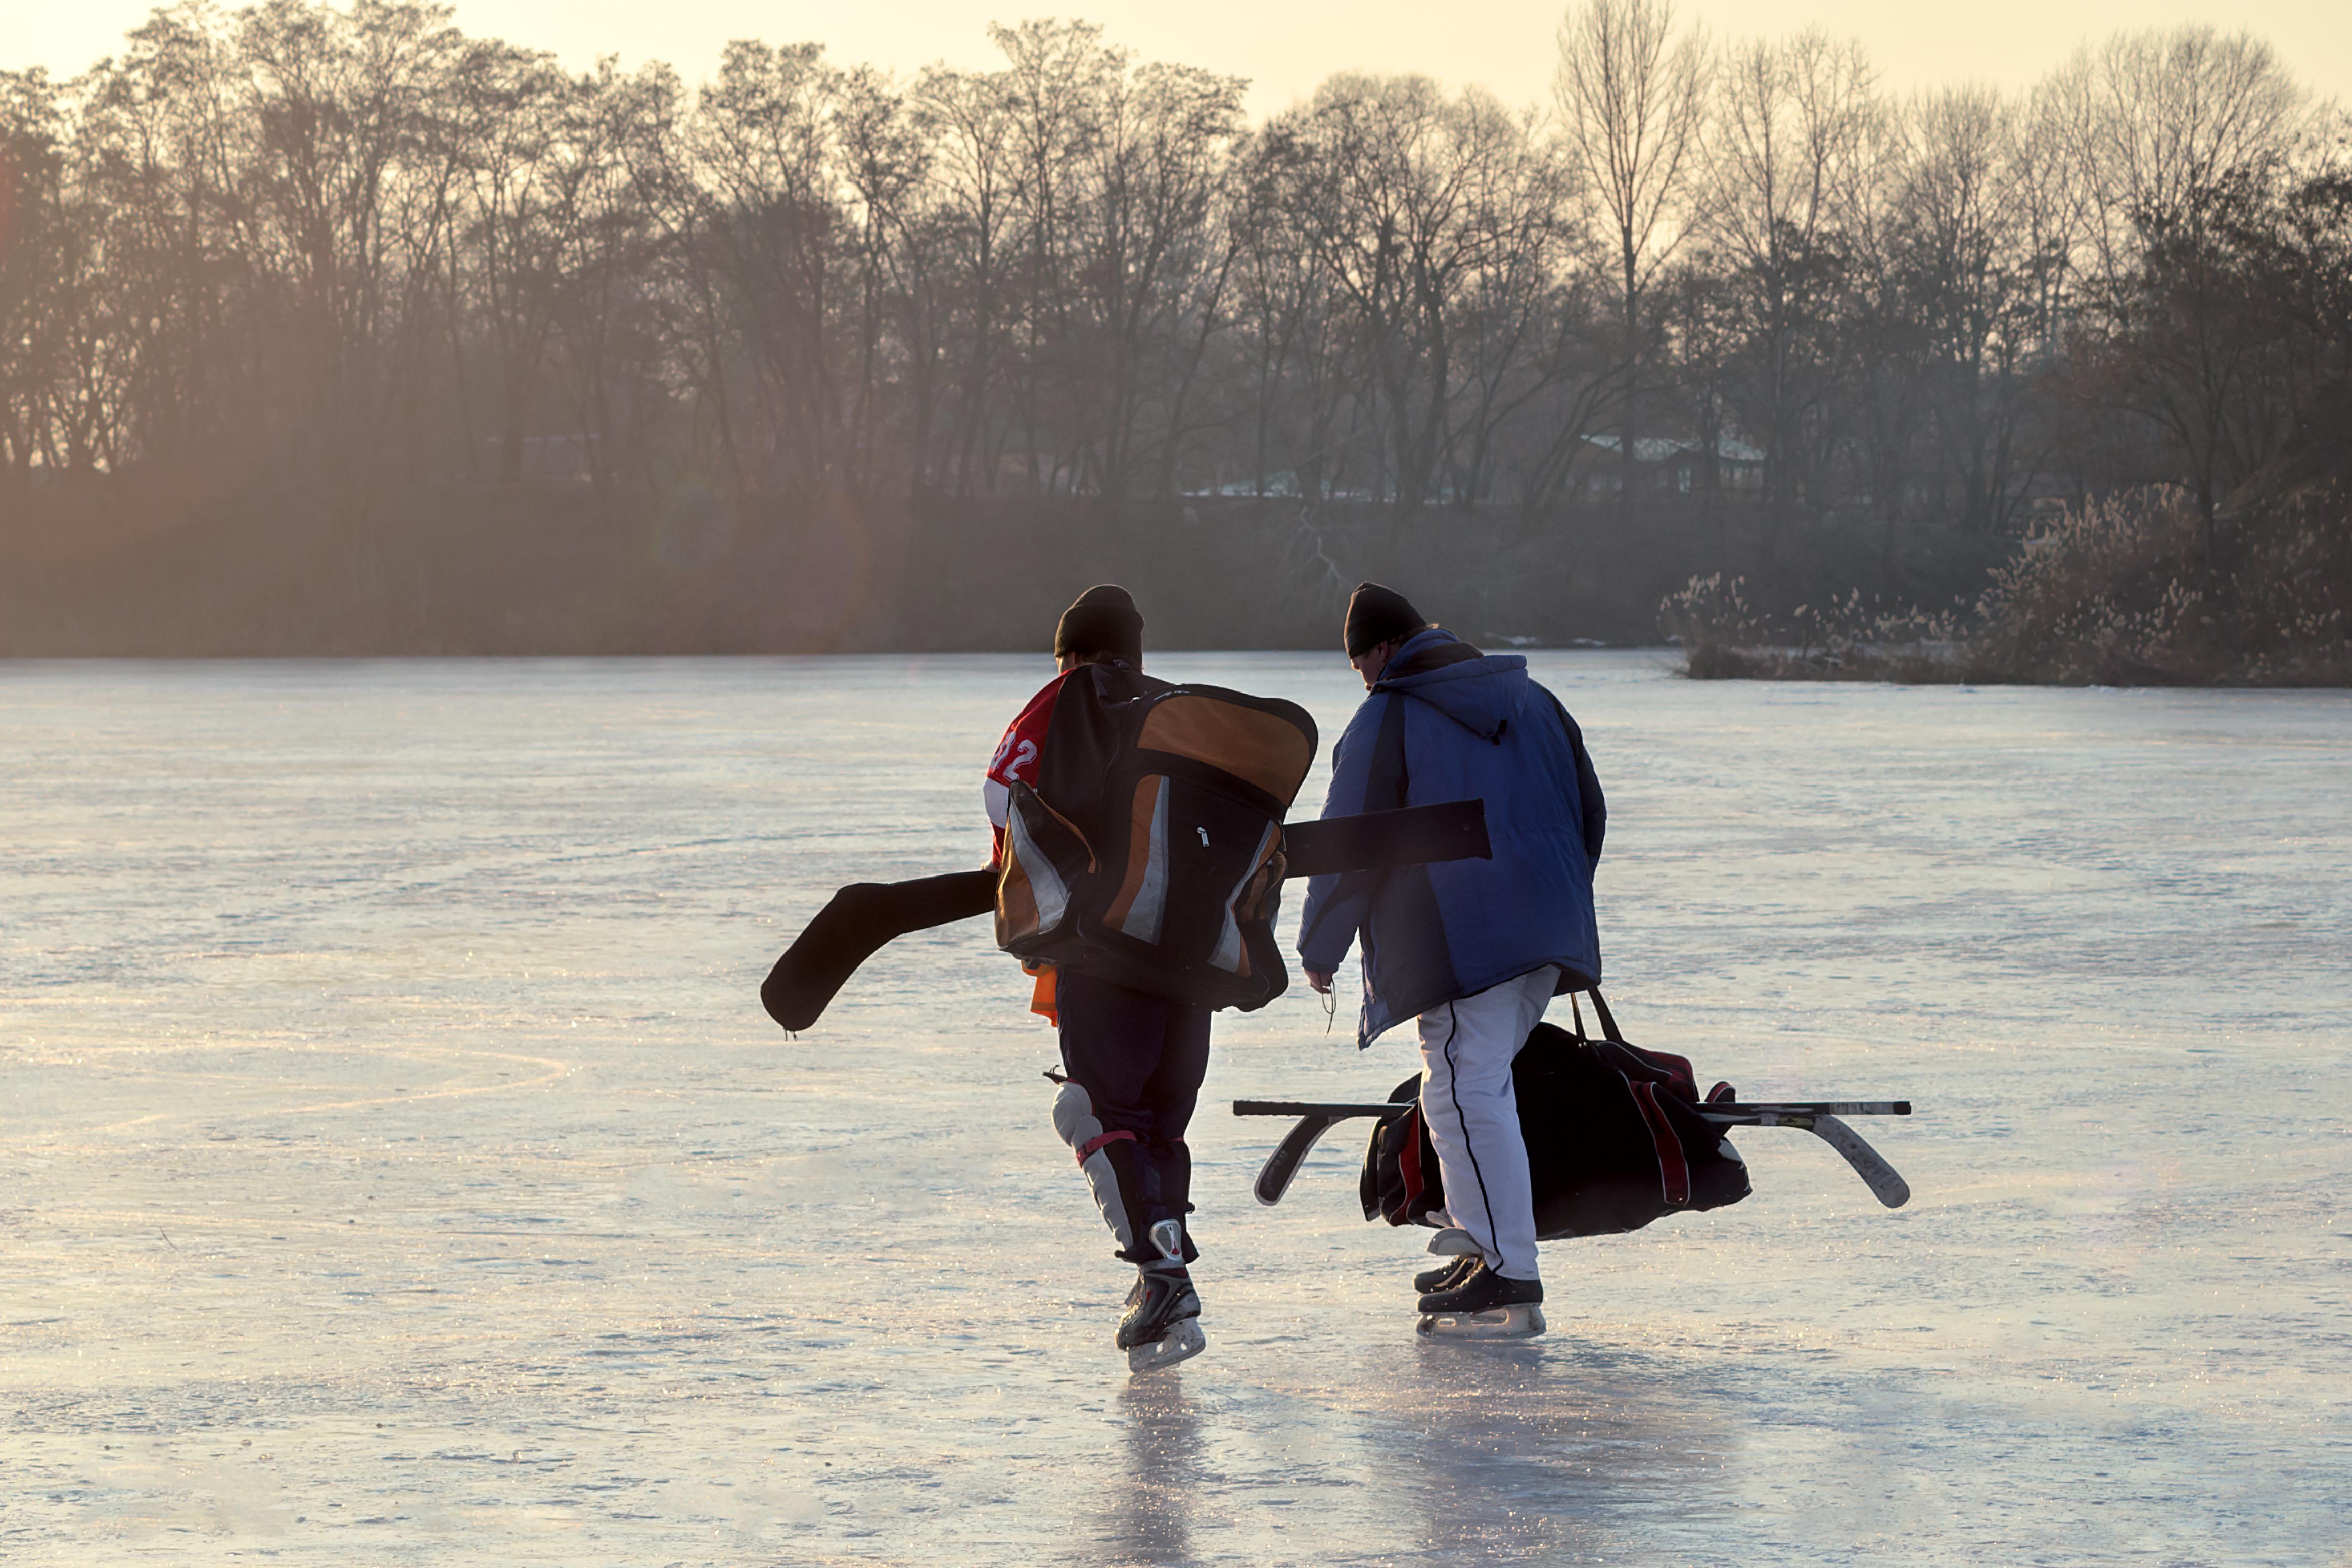 Canada 150 Pond Hockey